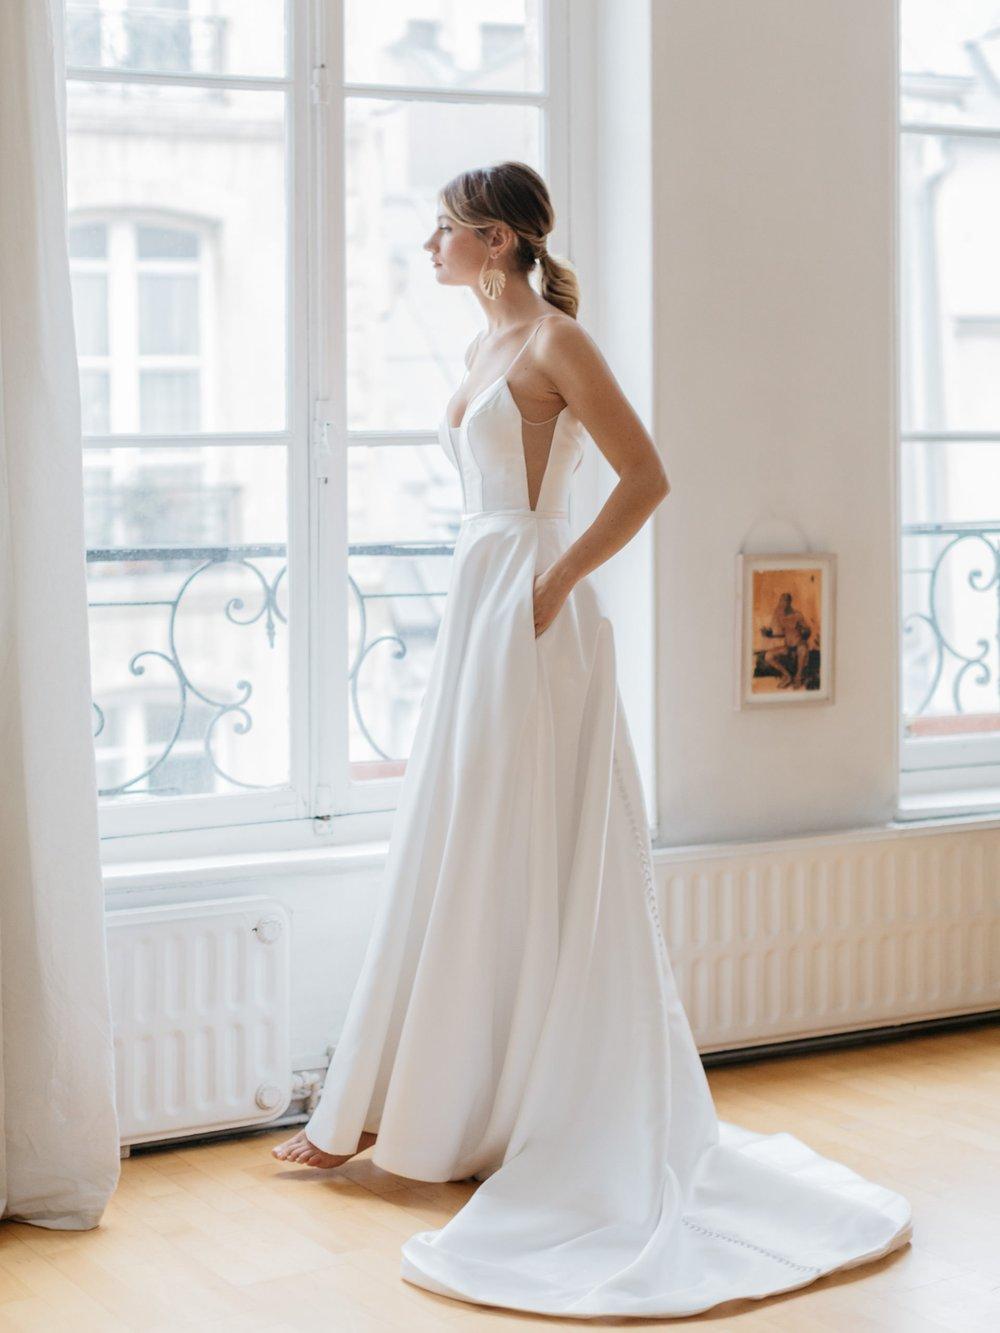 004-DAISY-Bridal-Lifestories-PARIS-2018-828A7108.jpg